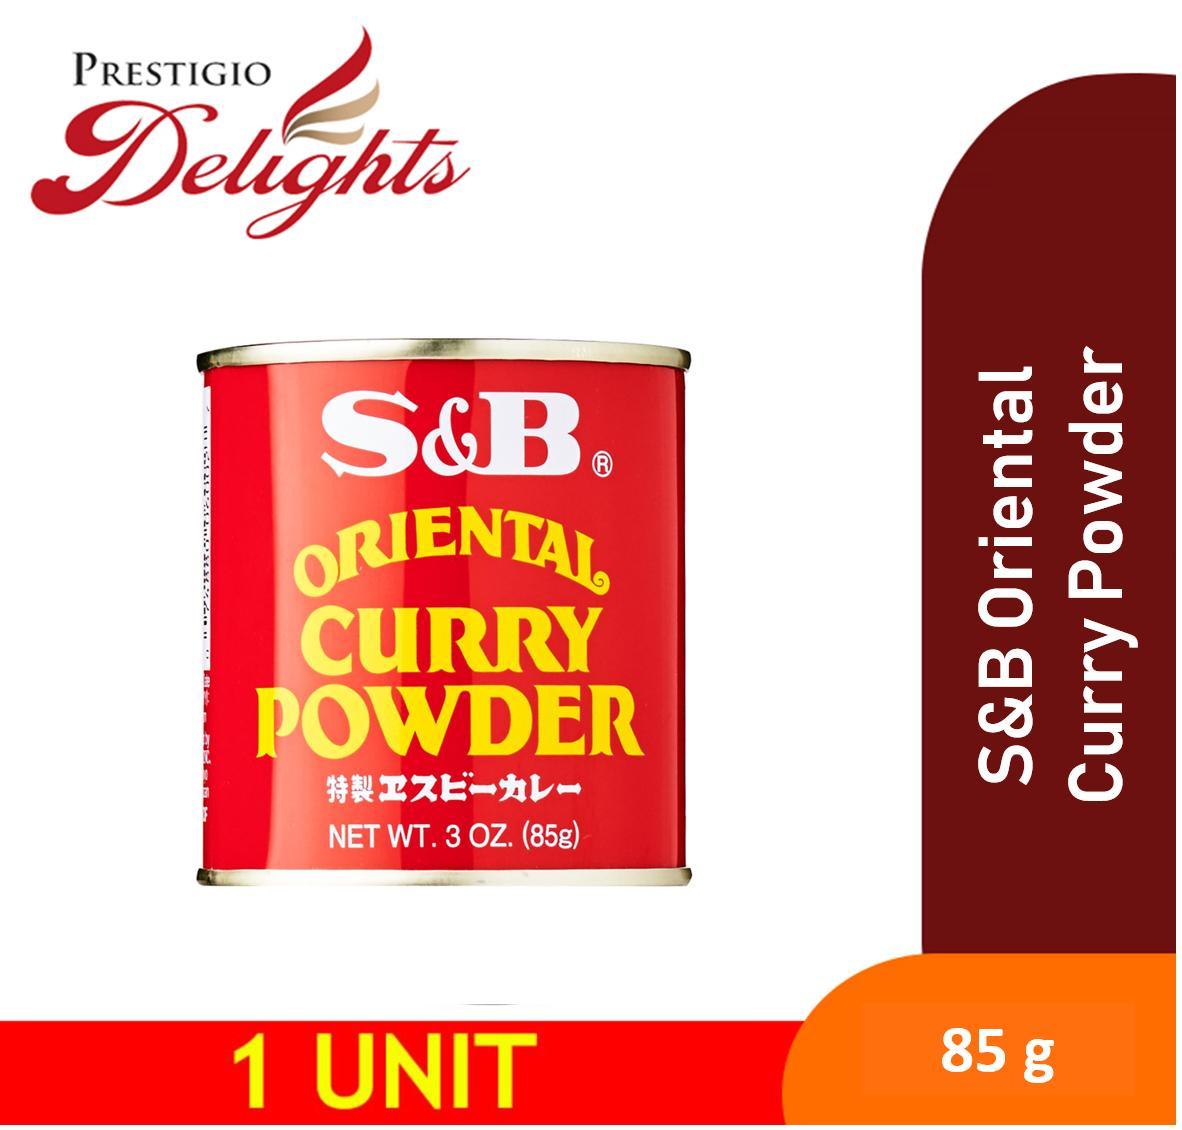 S&b Oriental Curry Powder 85g By Prestigio Delights.